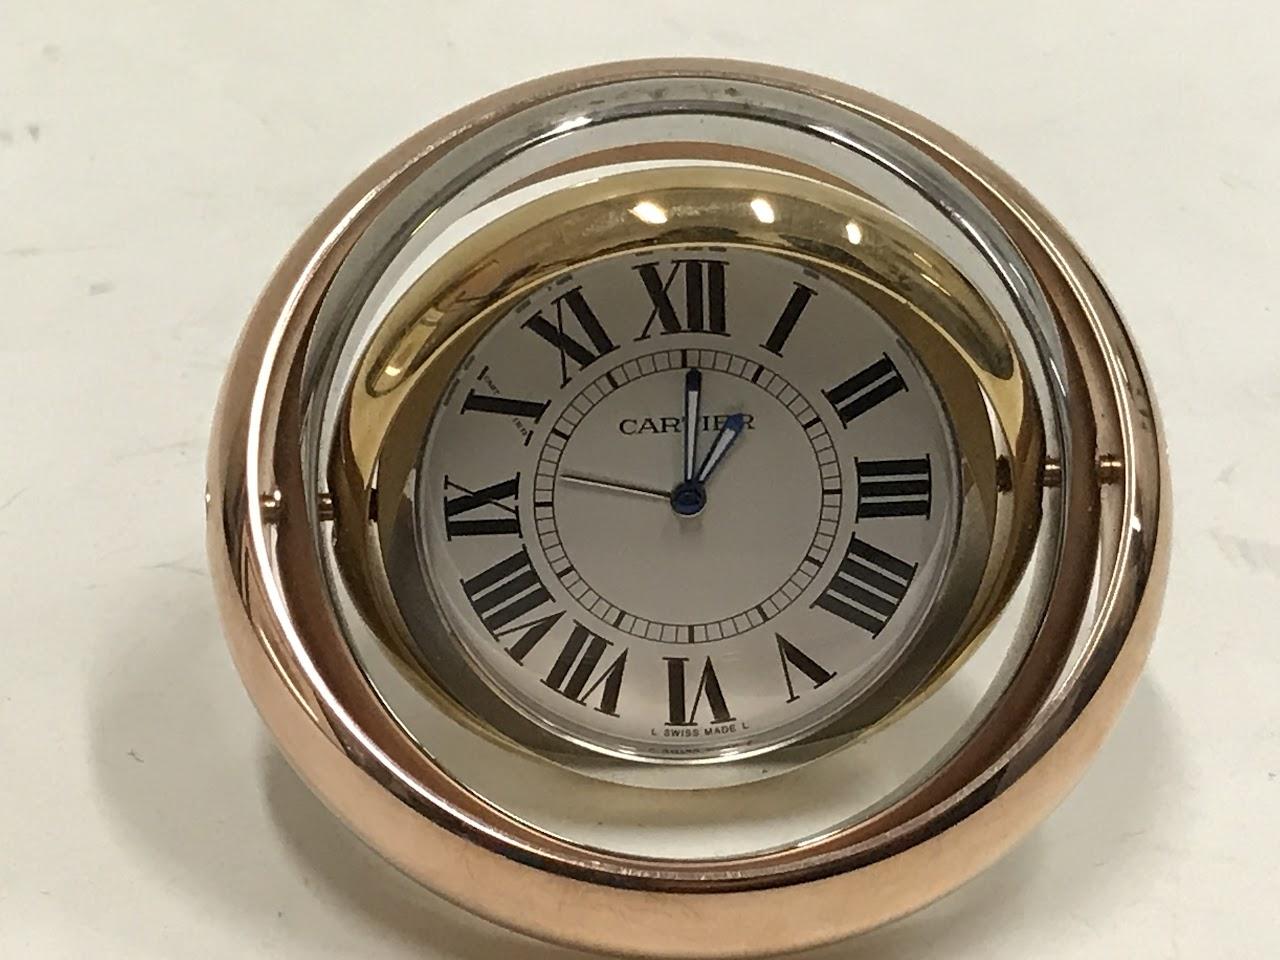 Cartier trinity travel alarm clock shophousingworks share it amipublicfo Images